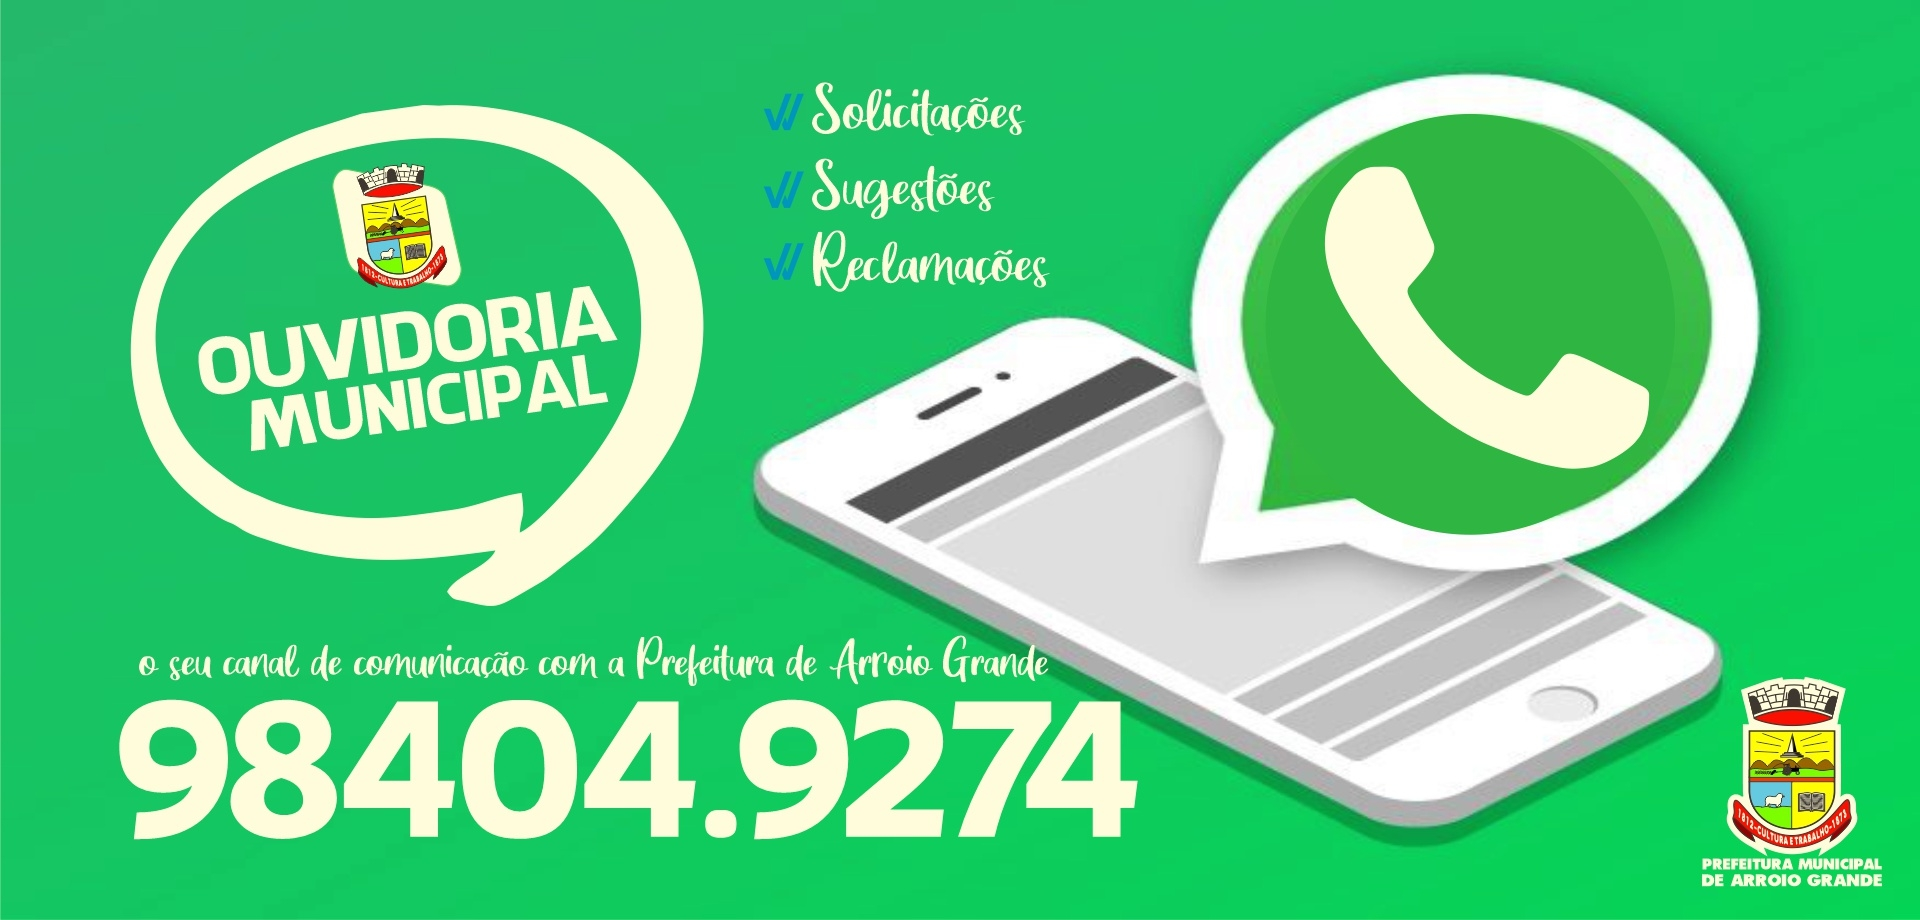 Ouvidoria Municipal inicia atendimento via Whatsapp